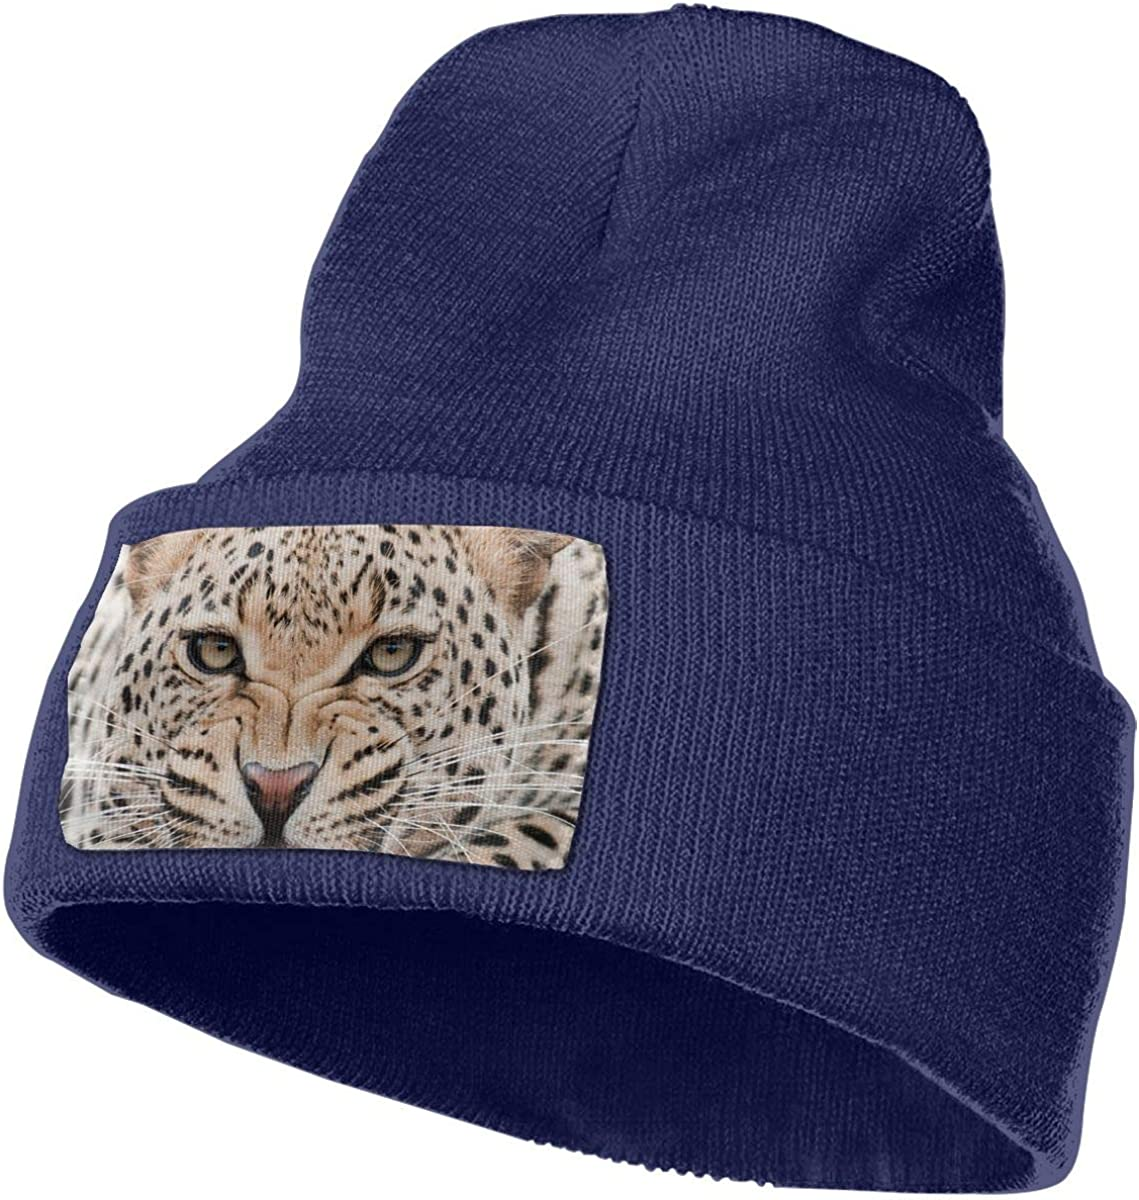 Angry Leopard Print Men/&Women Warm Winter Knit Plain Beanie Hat Skull Cap Acrylic Knit Cuff Hat